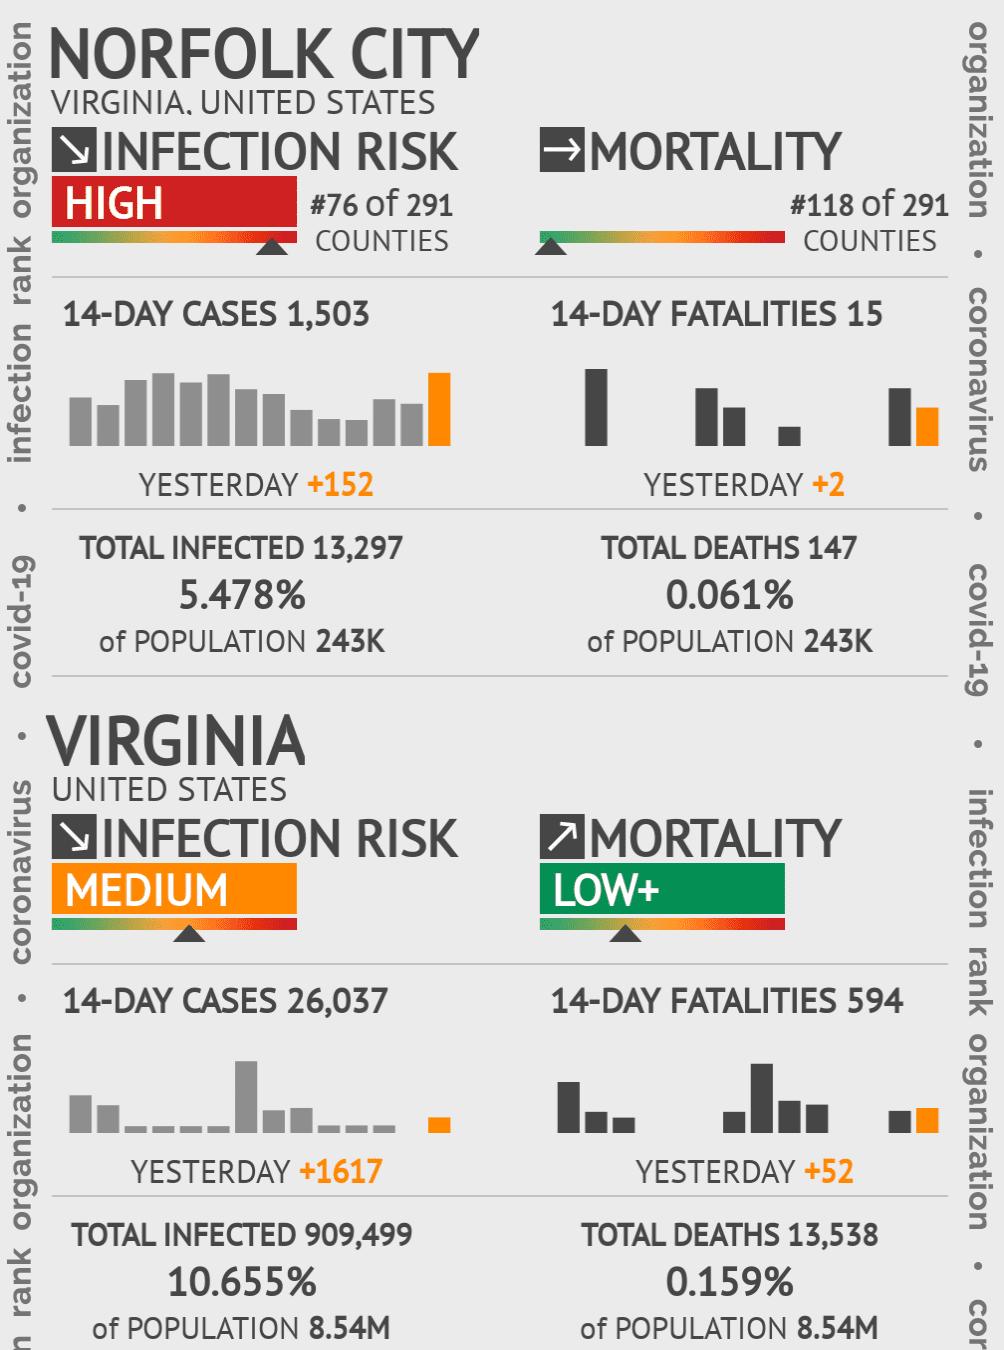 Norfolk City Coronavirus Covid-19 Risk of Infection on February 04, 2021